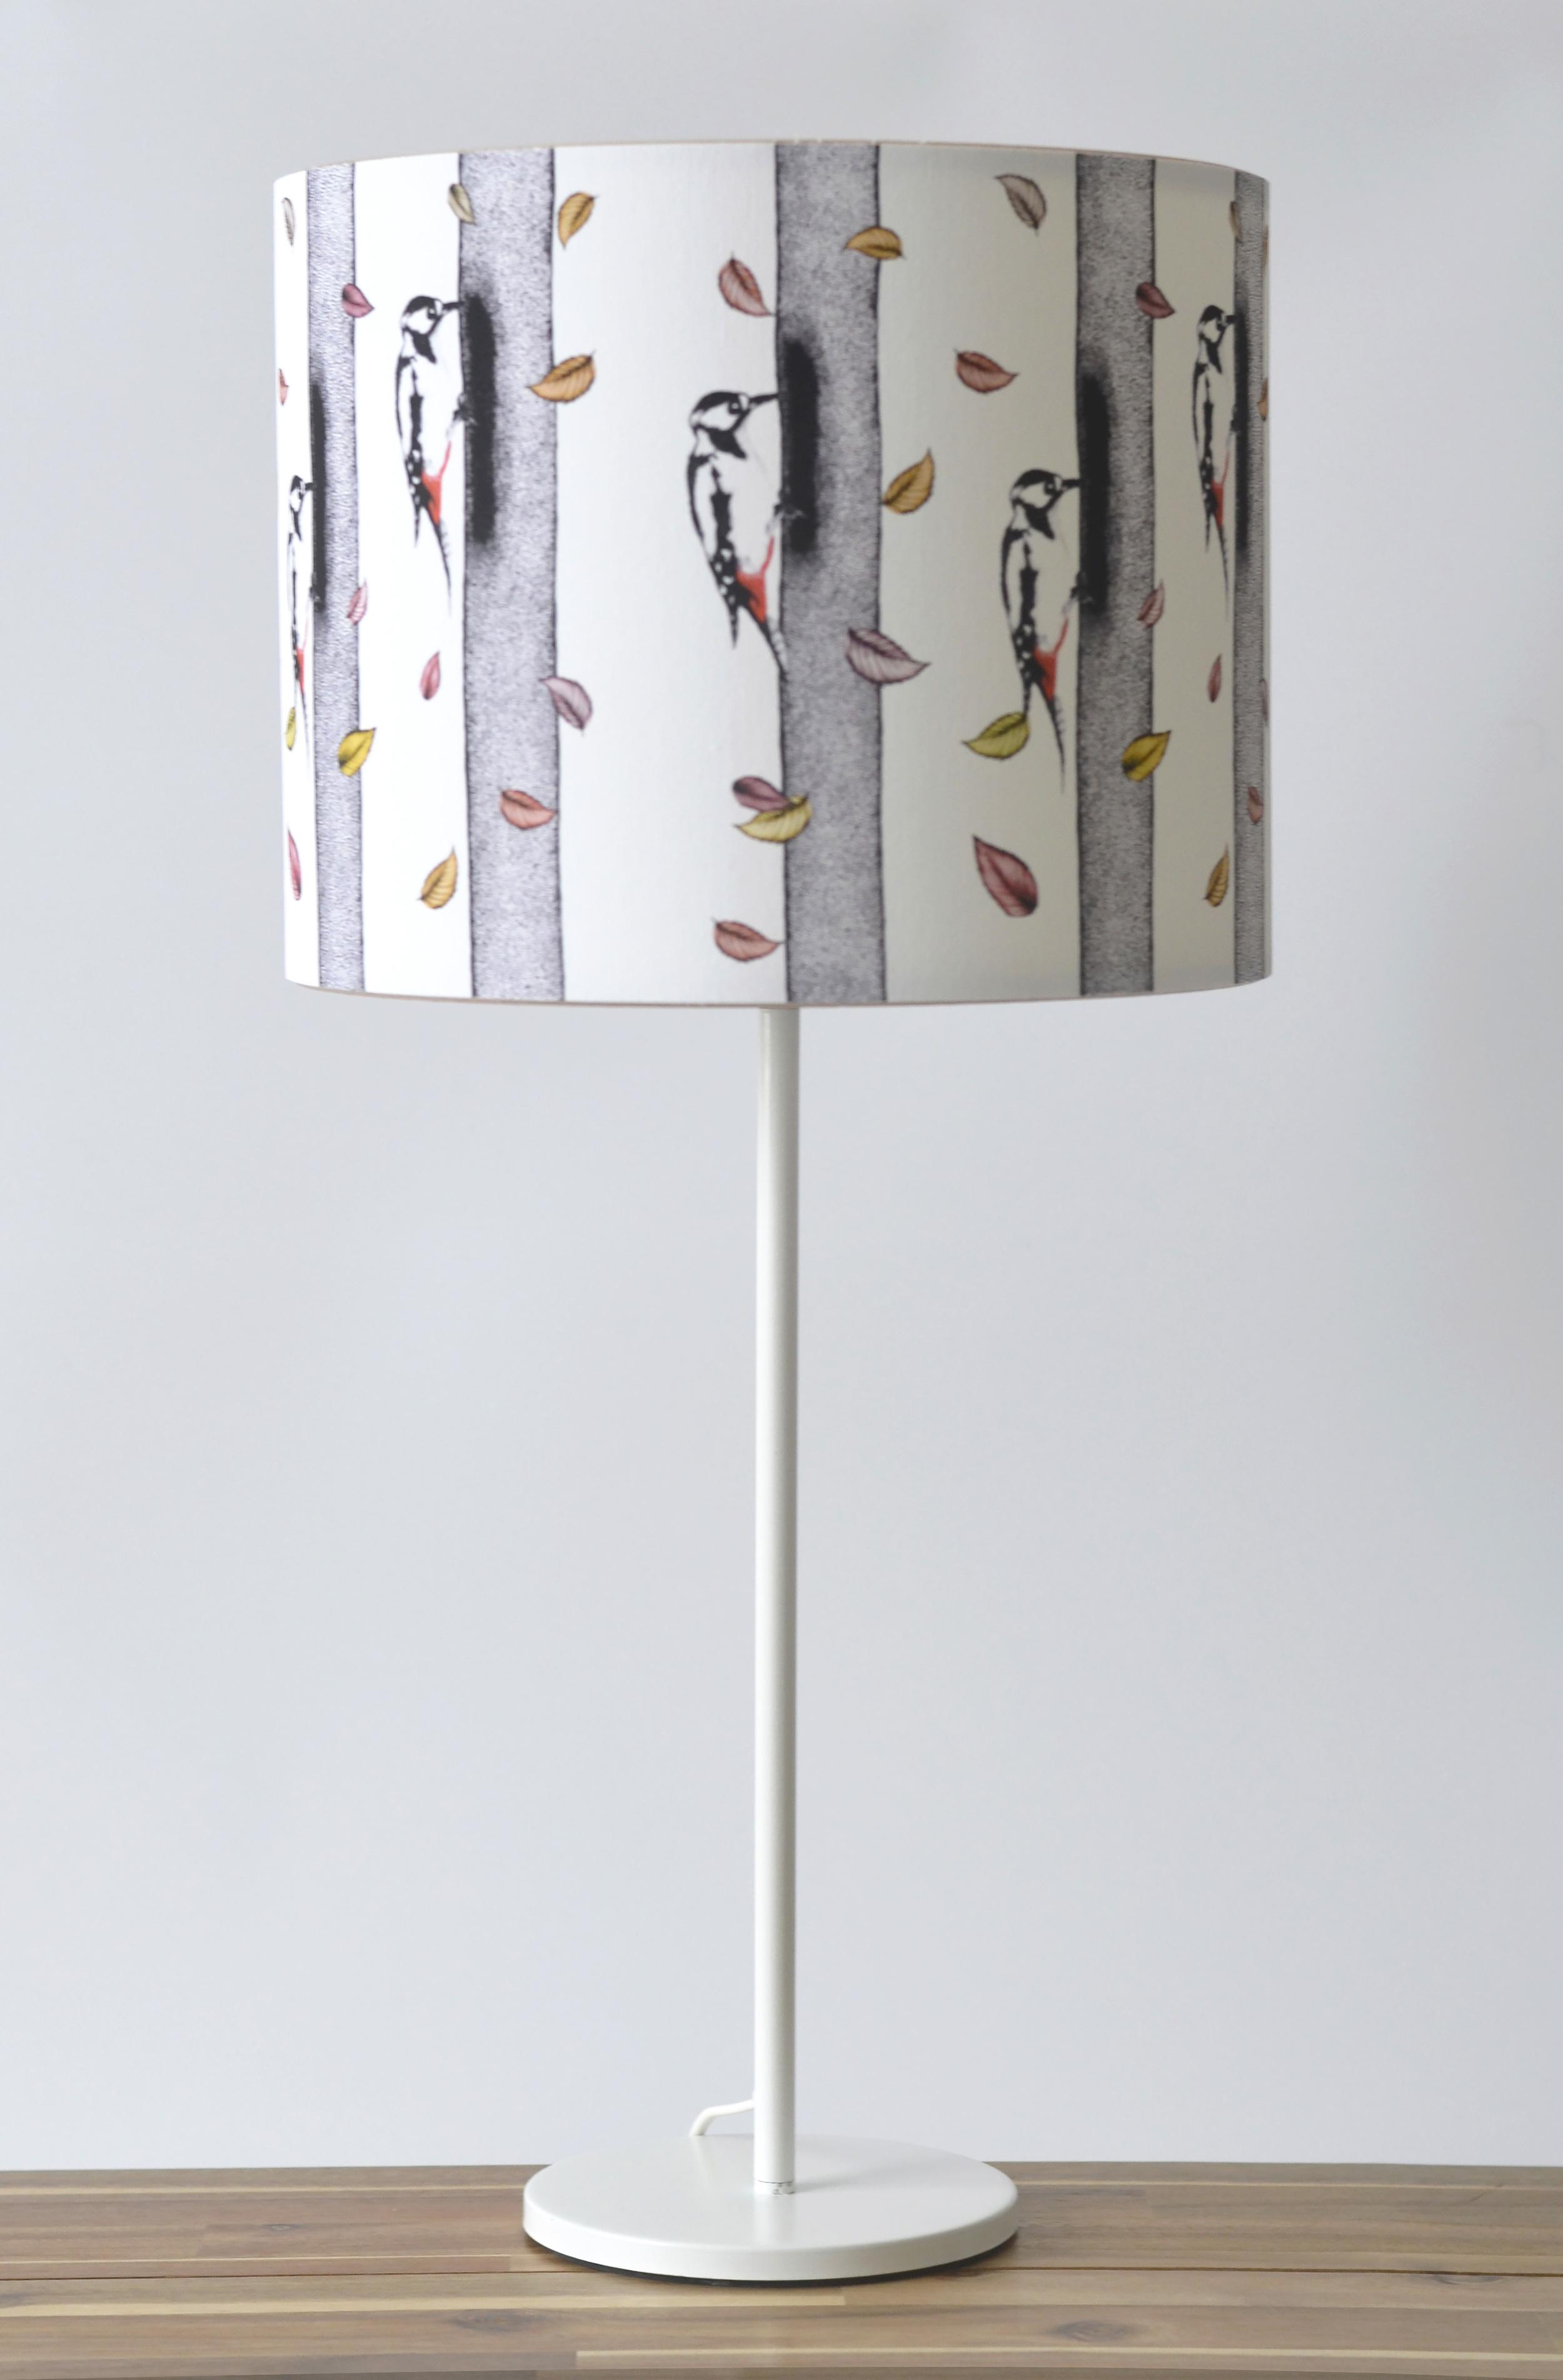 lighting lamp shades. WOODPECKER LAMPSHADE Lighting Lamp Shades